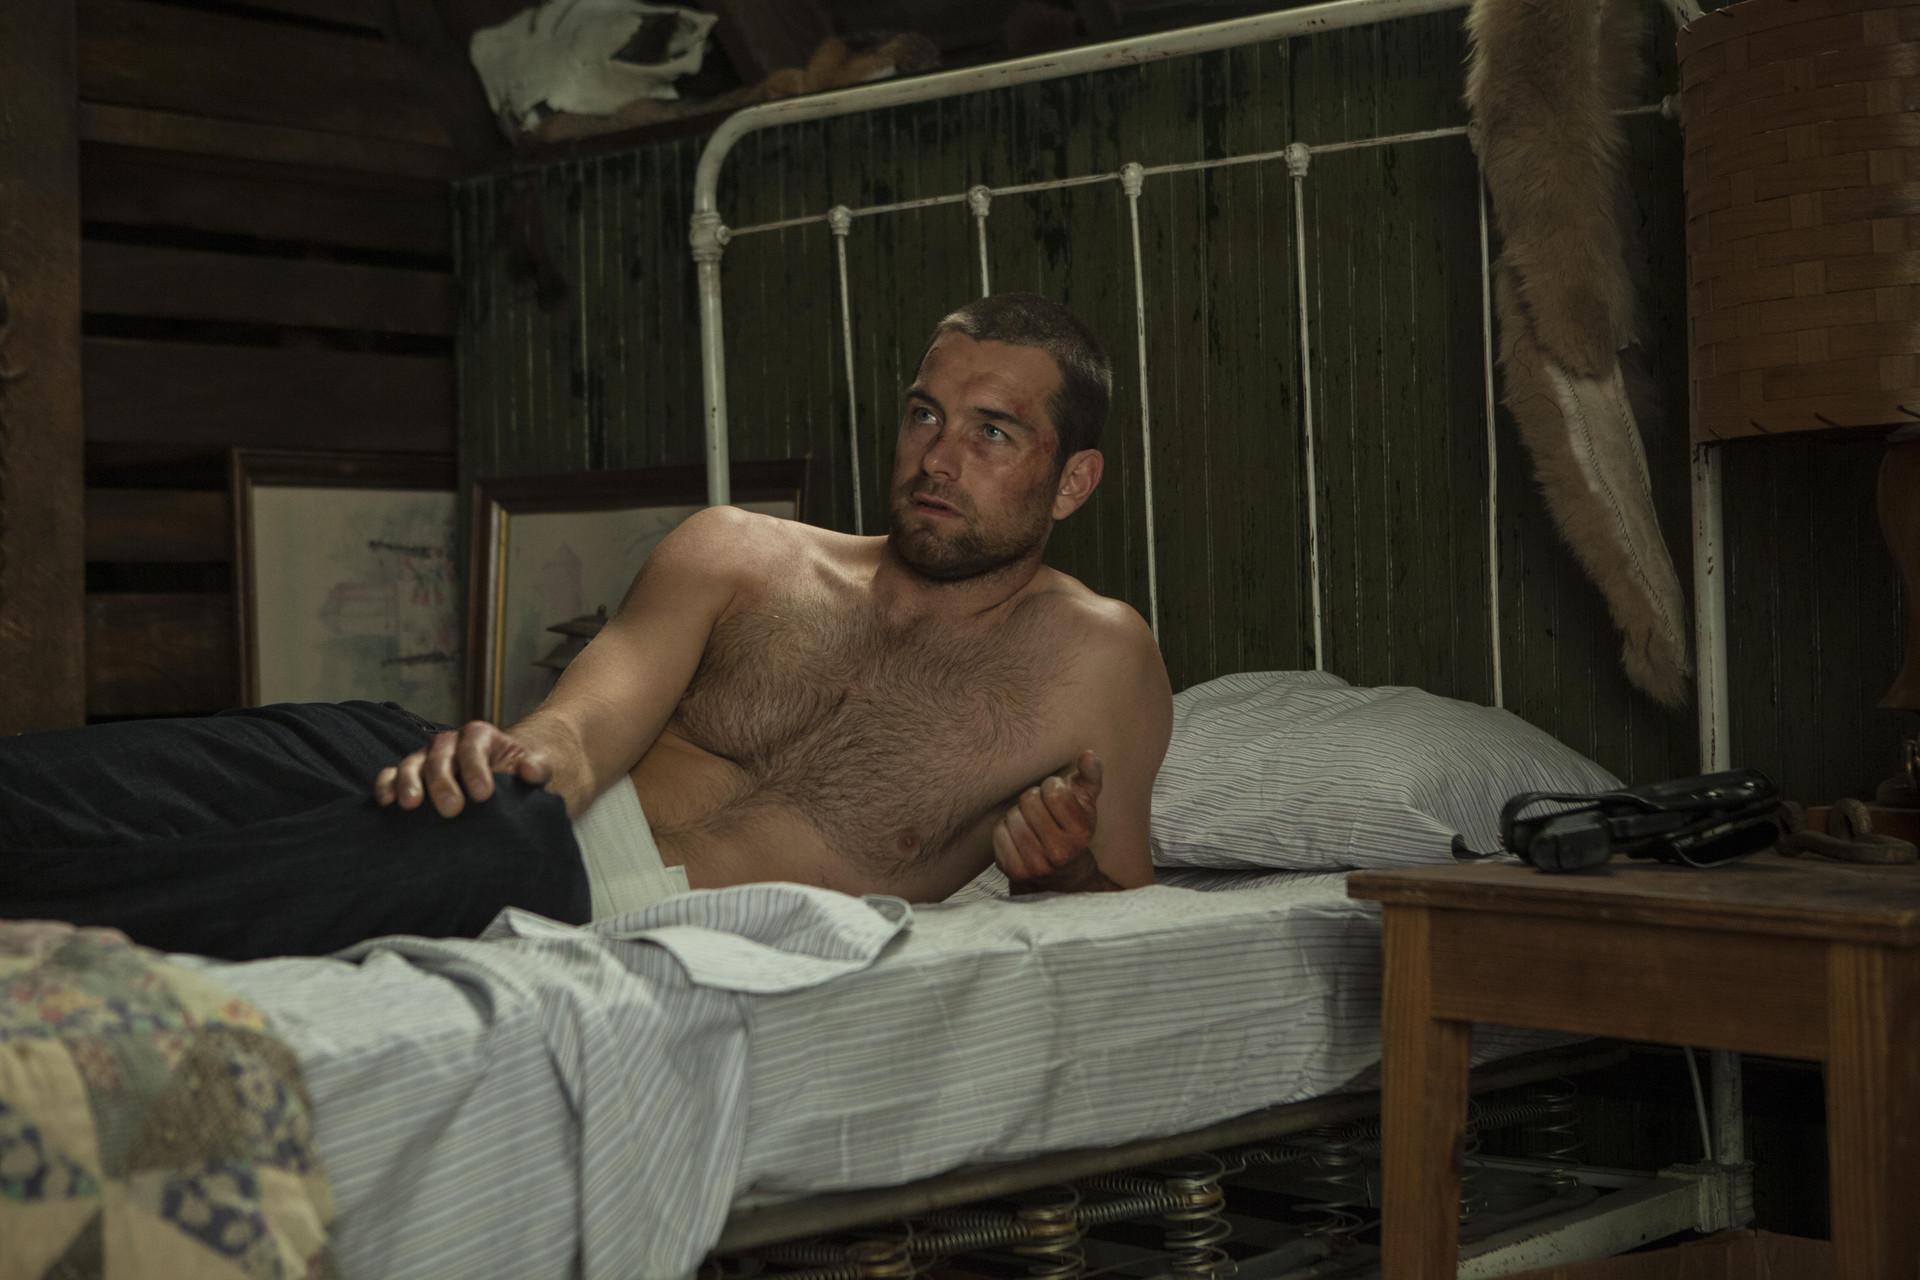 Antony Starr as Lucas 兜帽, 罩, 发动机罩 in 'Banshee'